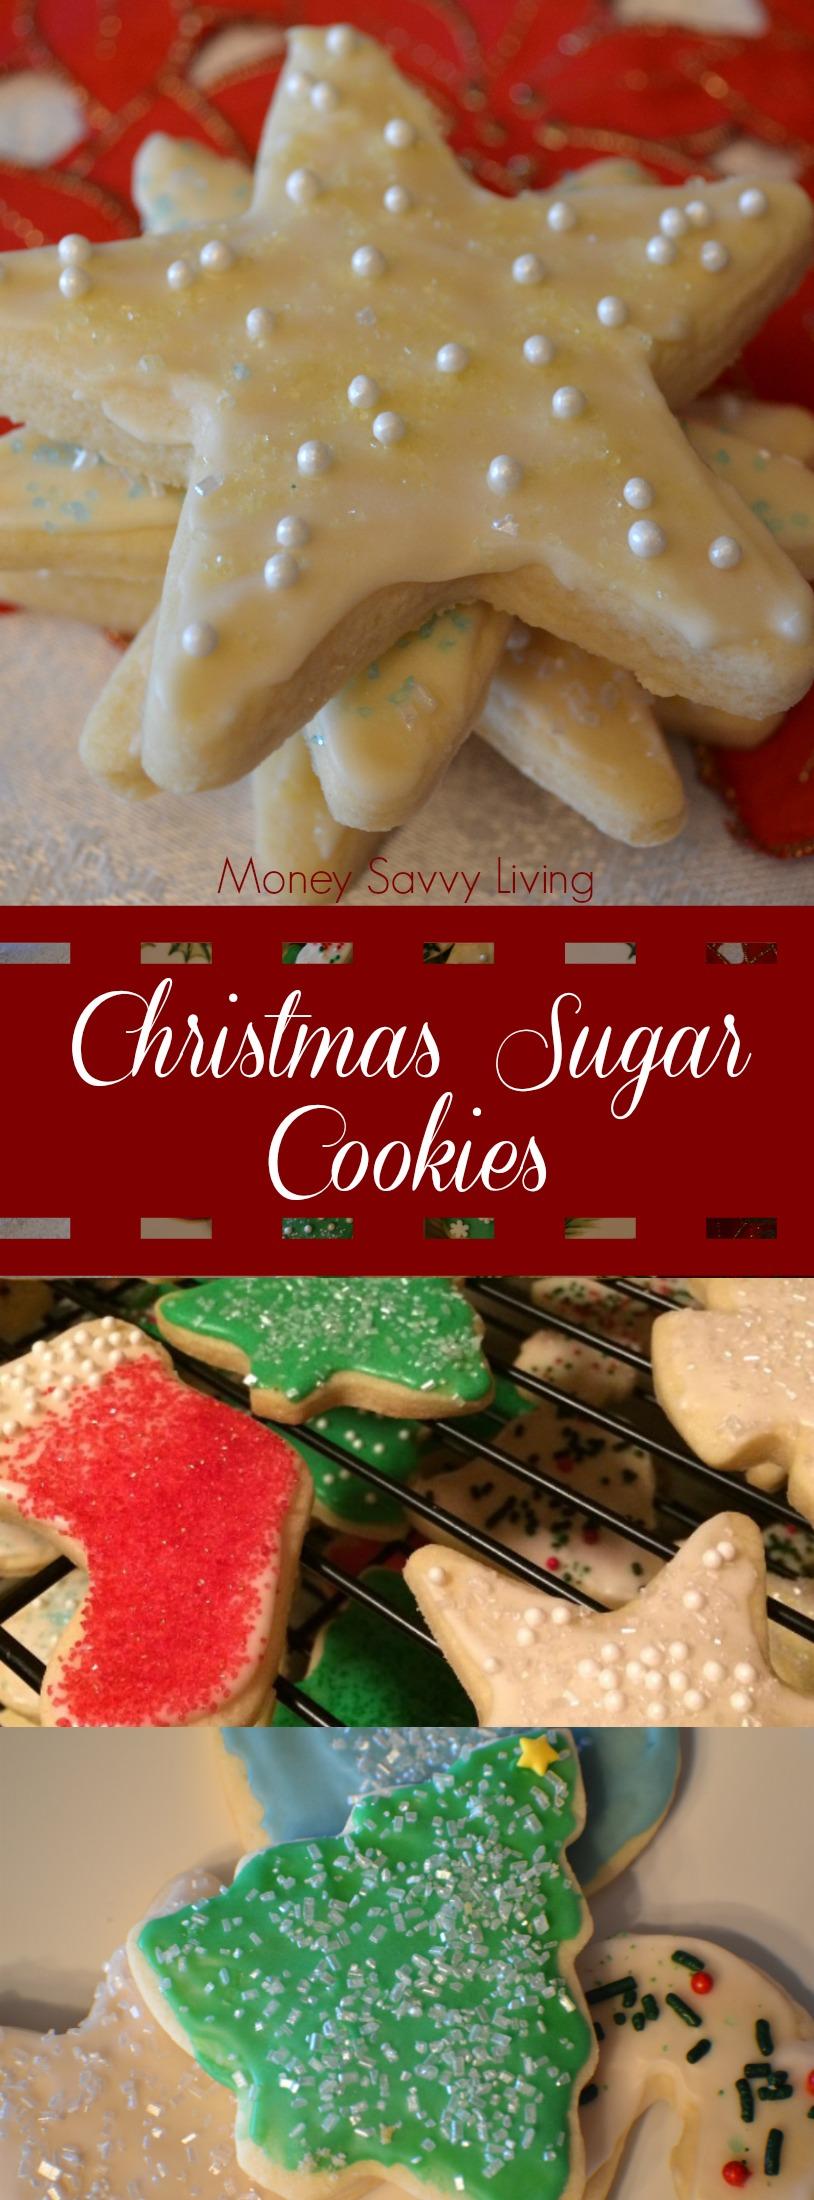 Best Ever Christmas Sugar Cookies | Money Savvy Living